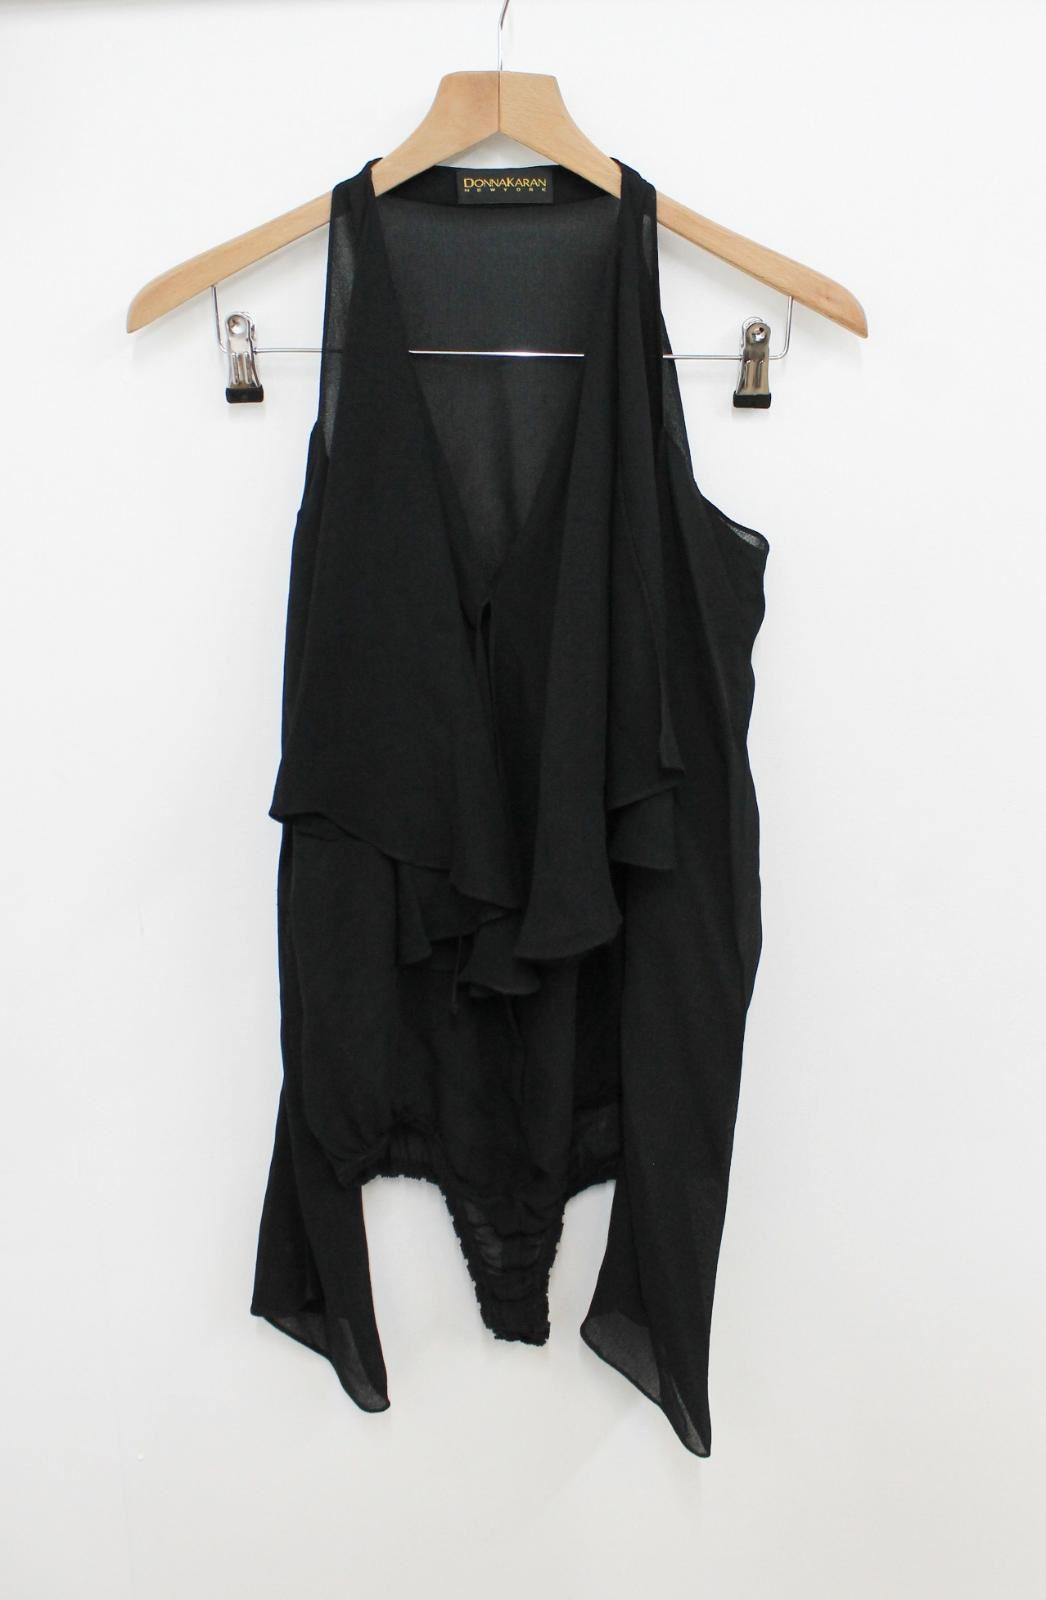 Ladies Bodysuit Sleeved Mesh York Shoulders Long Donna Cold Uk8 Black New Karan vO1w4St